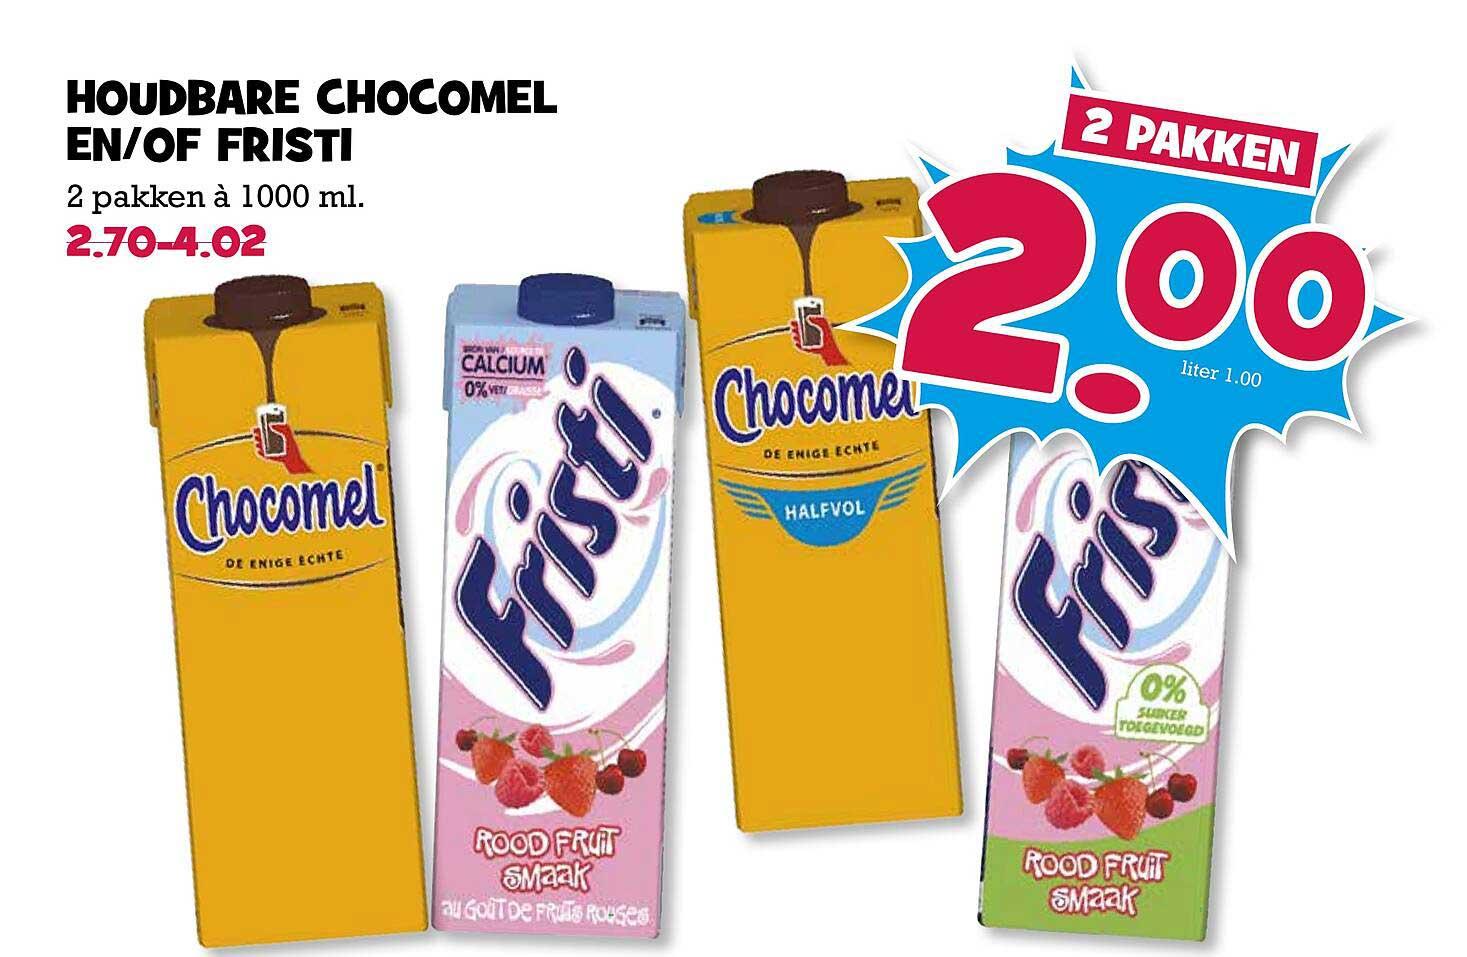 Boon's Markt Houdbare Chocomel En-of Fristi